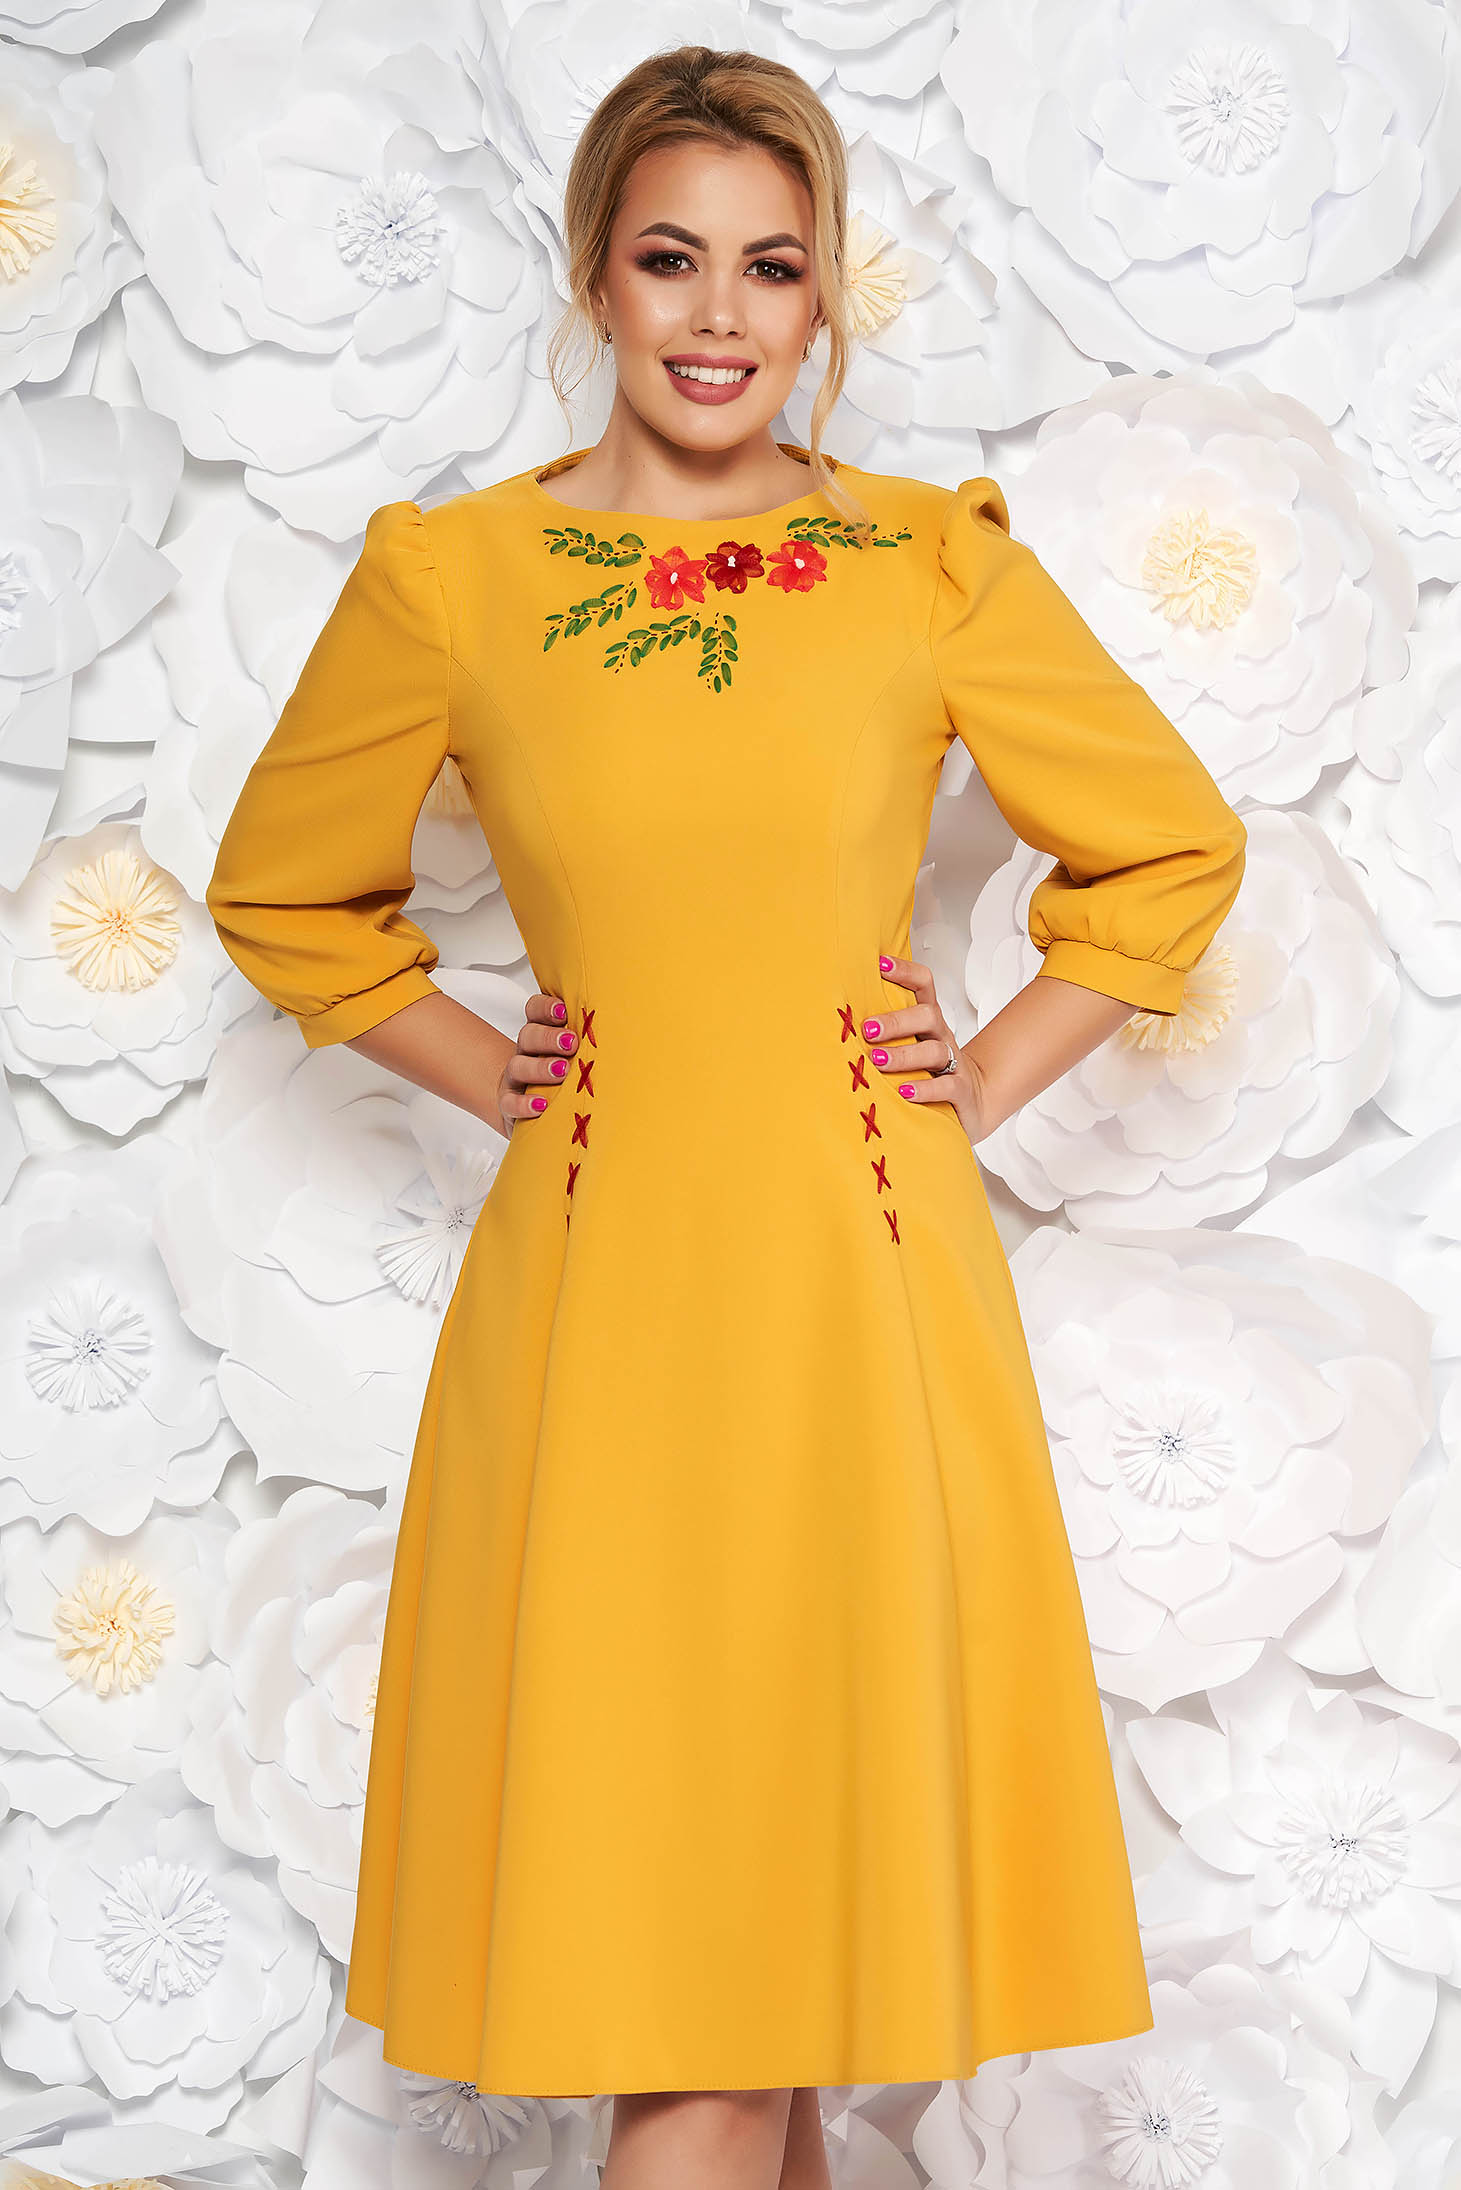 Rochie LaDonna mustarie eleganta brodata in clos din stofa usor elastica cu maneci trei-sferturi